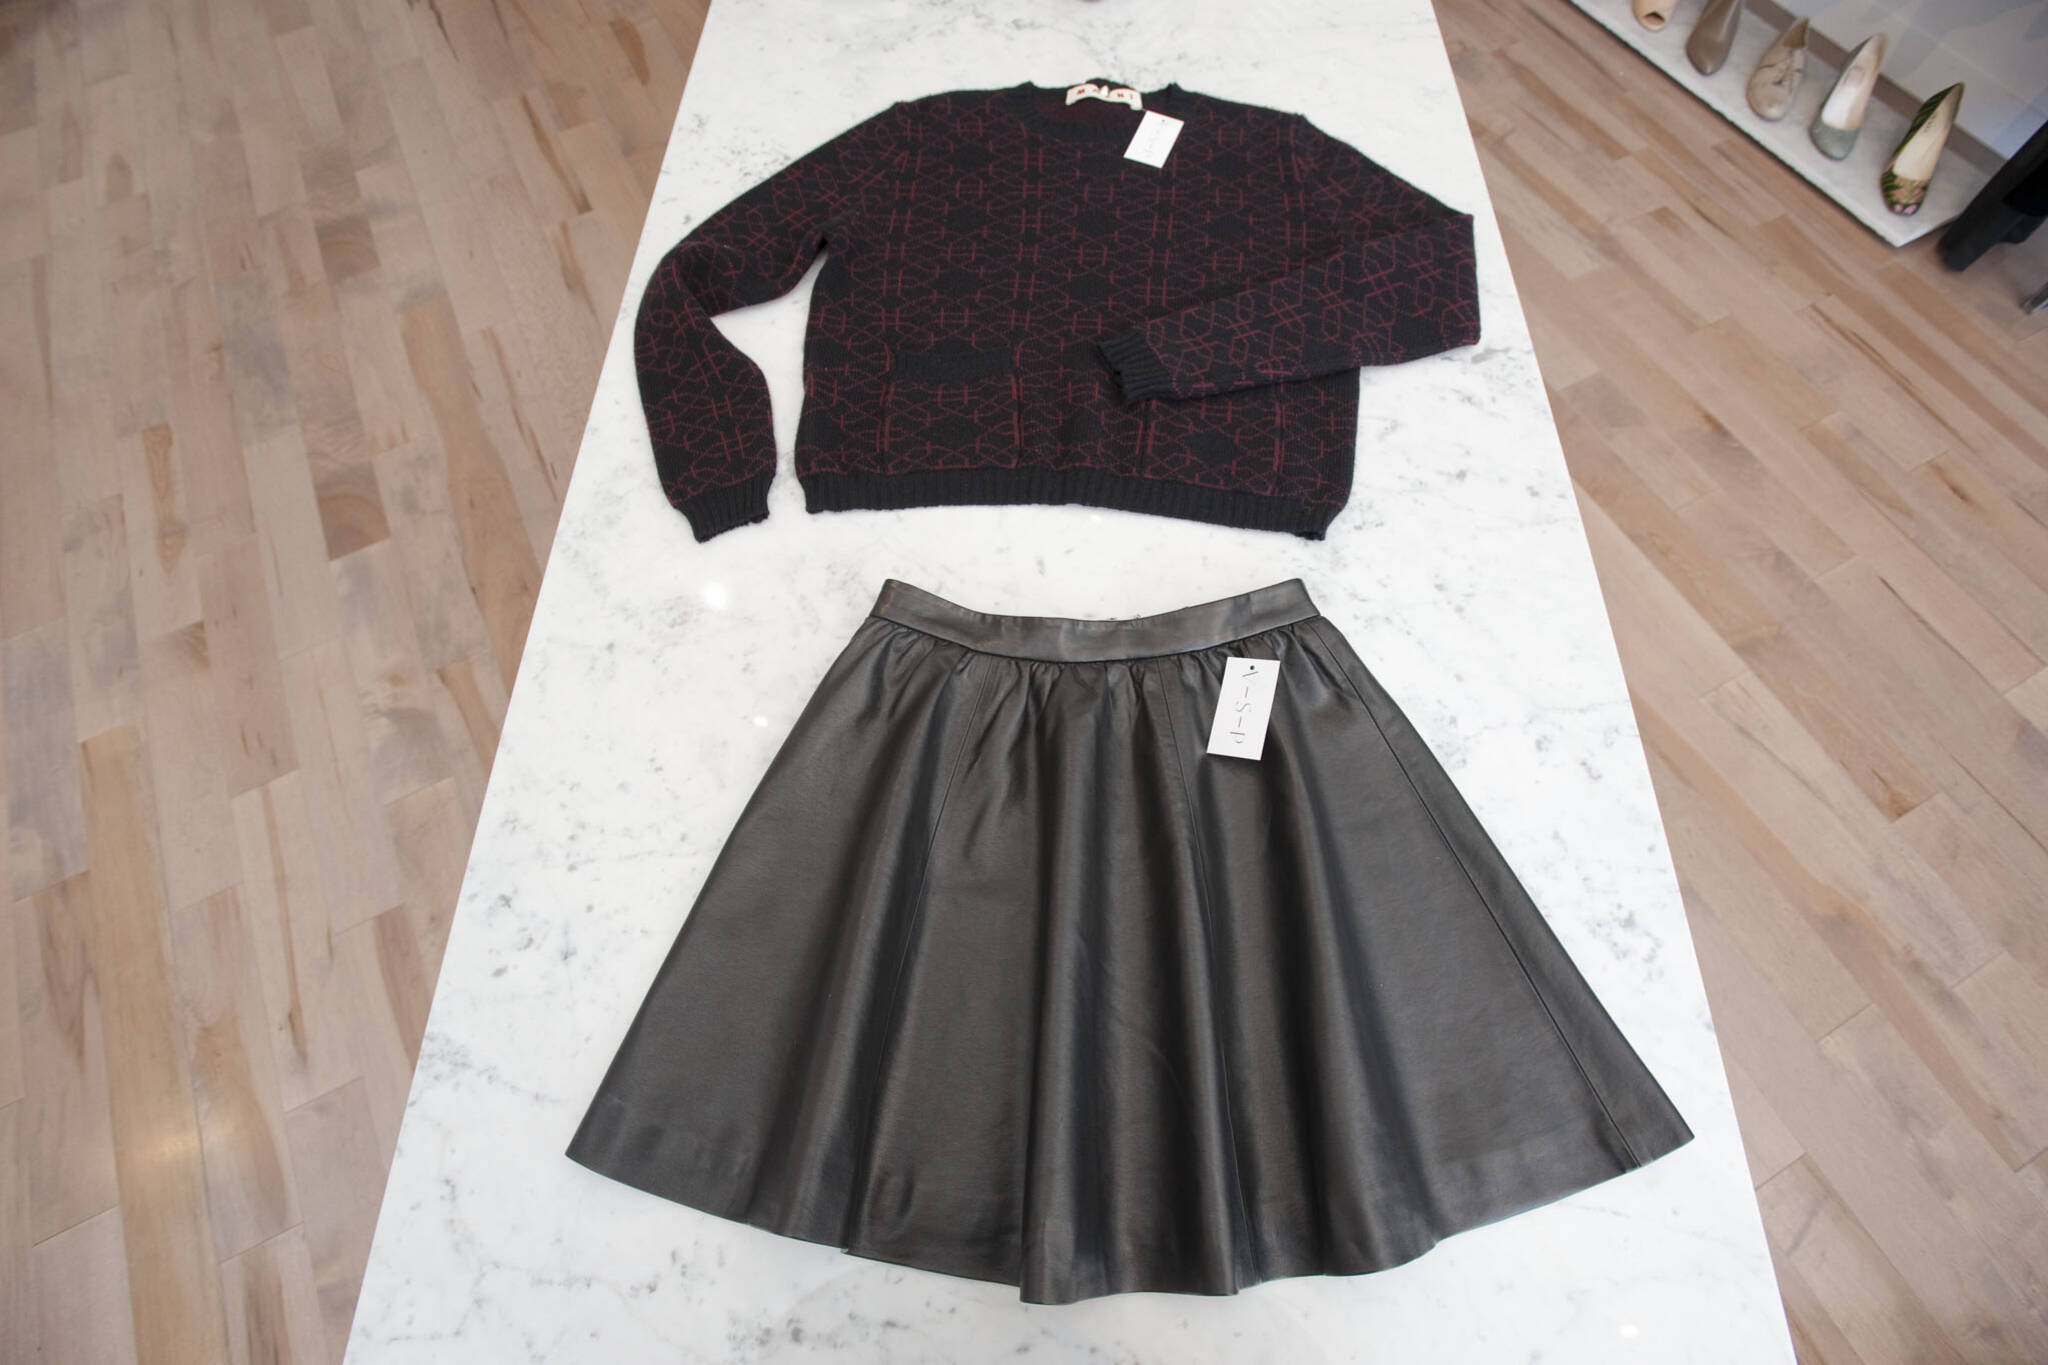 Designer Clothing Toronto